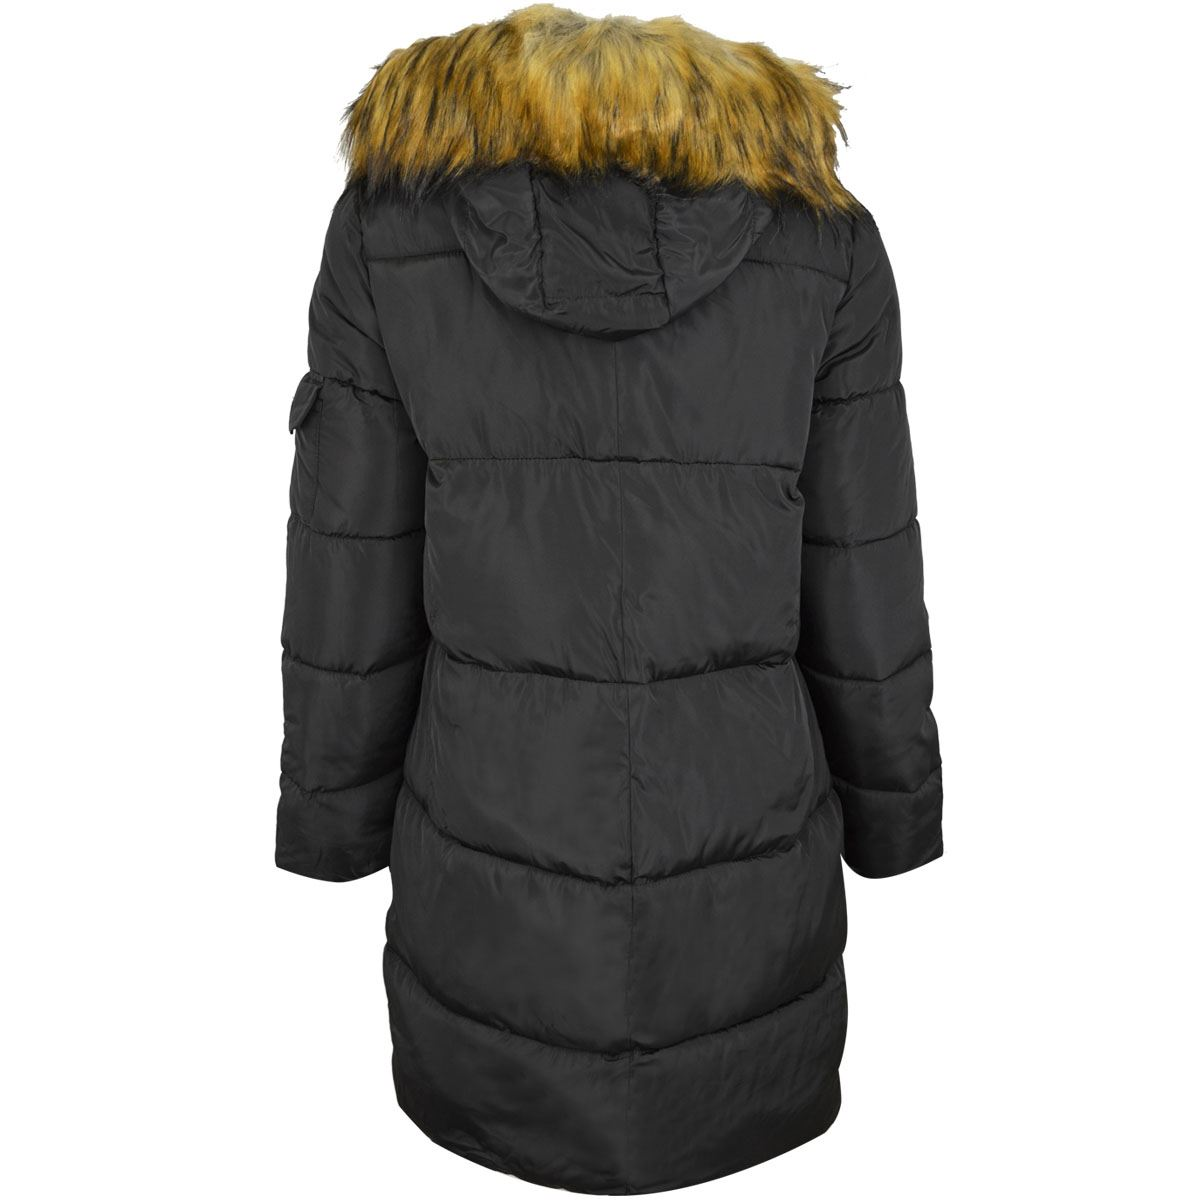 Womens Ladies Long Winter Coat Detachable Furry Hood Warm